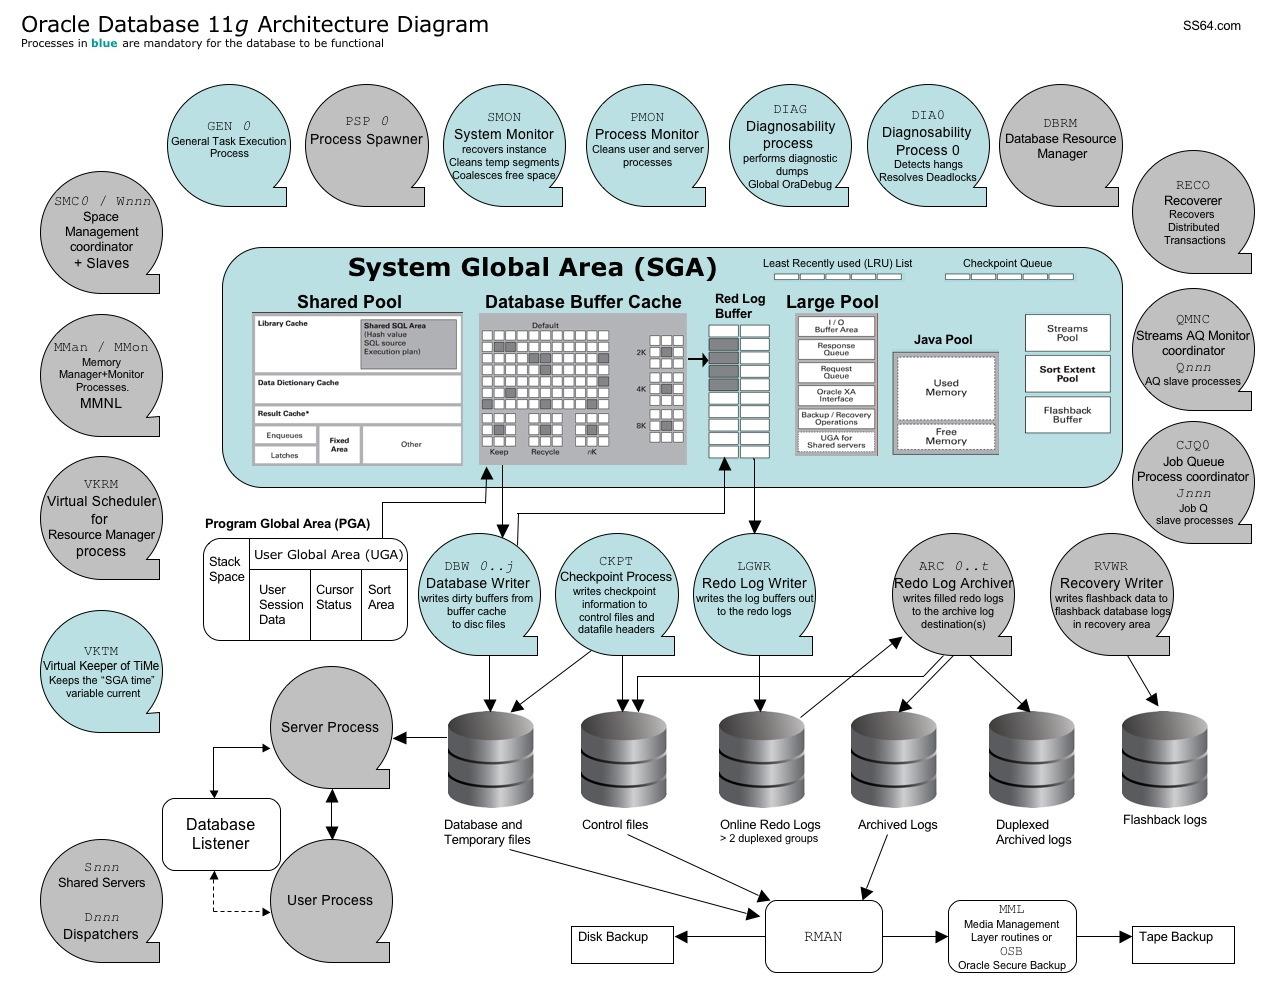 High Quality Diagrama Da Arquitetura U2013 Oracle Database 11g Design